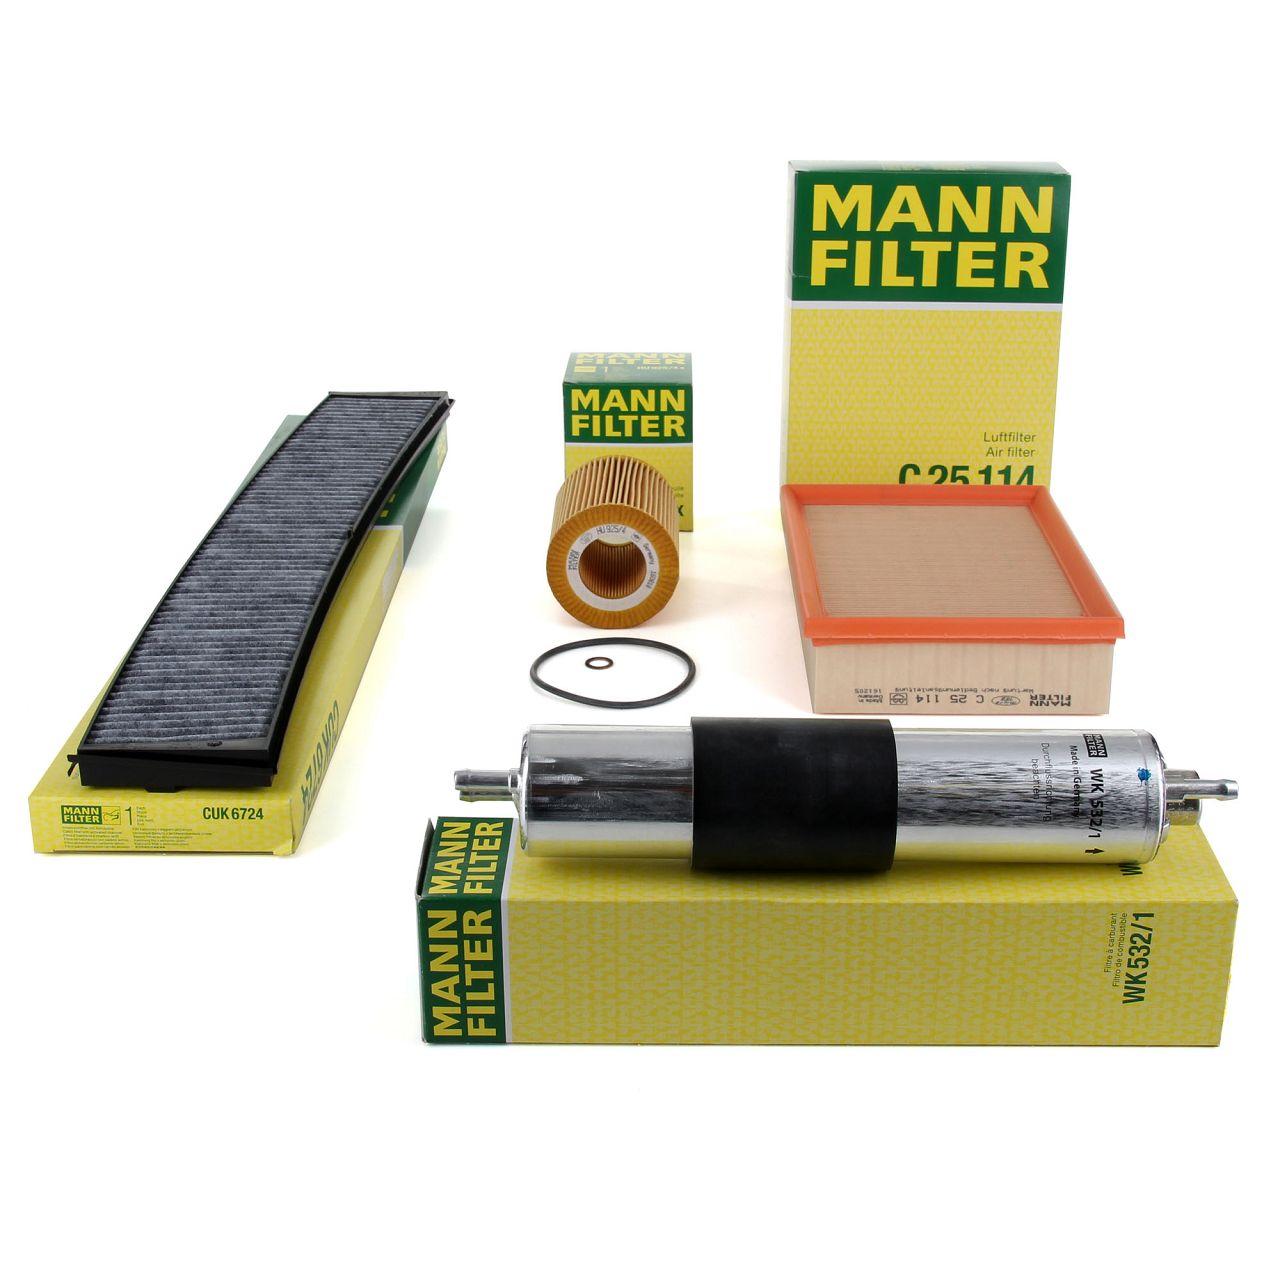 MANN Inspektionskit Filterpaket für BMW 3er E46 320i 325i 330i 170/192/231 PS